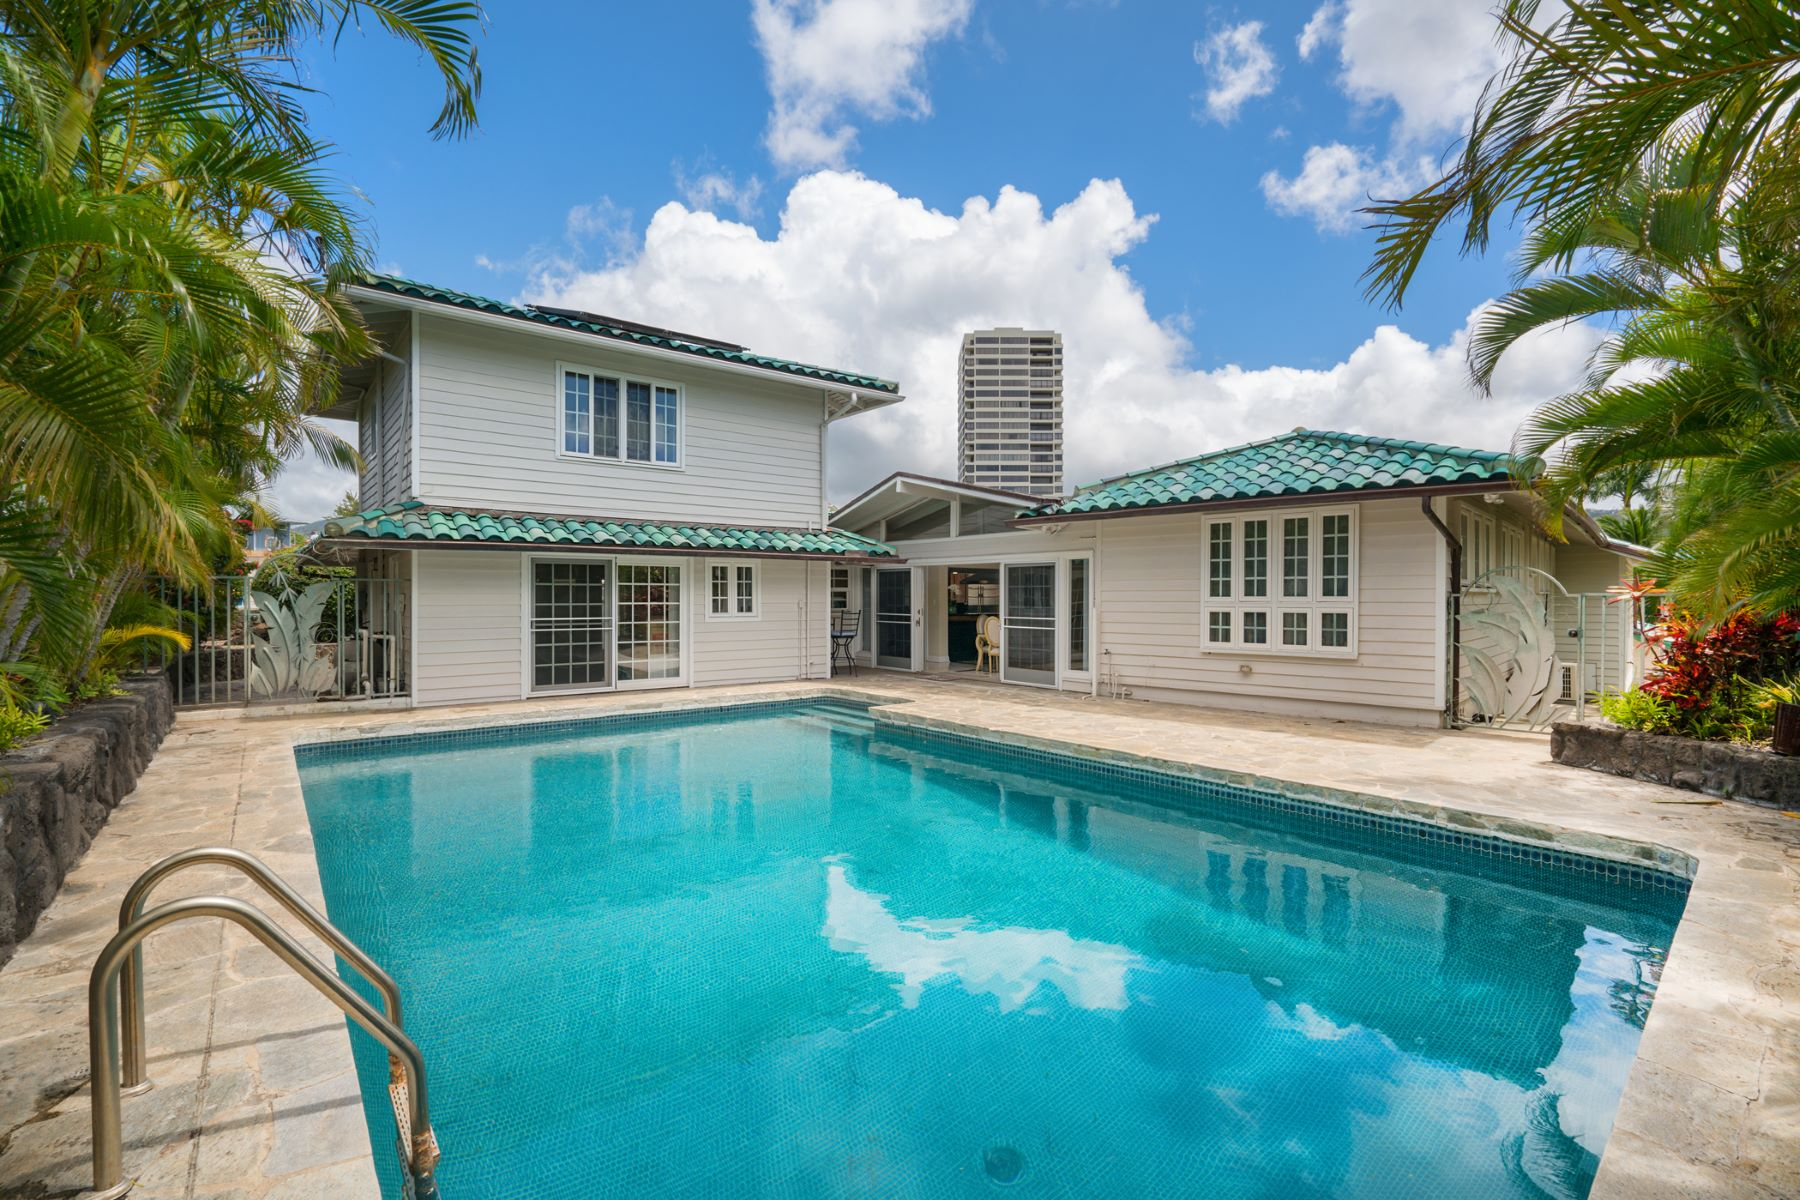 Additional photo for property listing at Kahala Hideaway 1344 Pueo St Honolulu, Hawaii 96816 United States